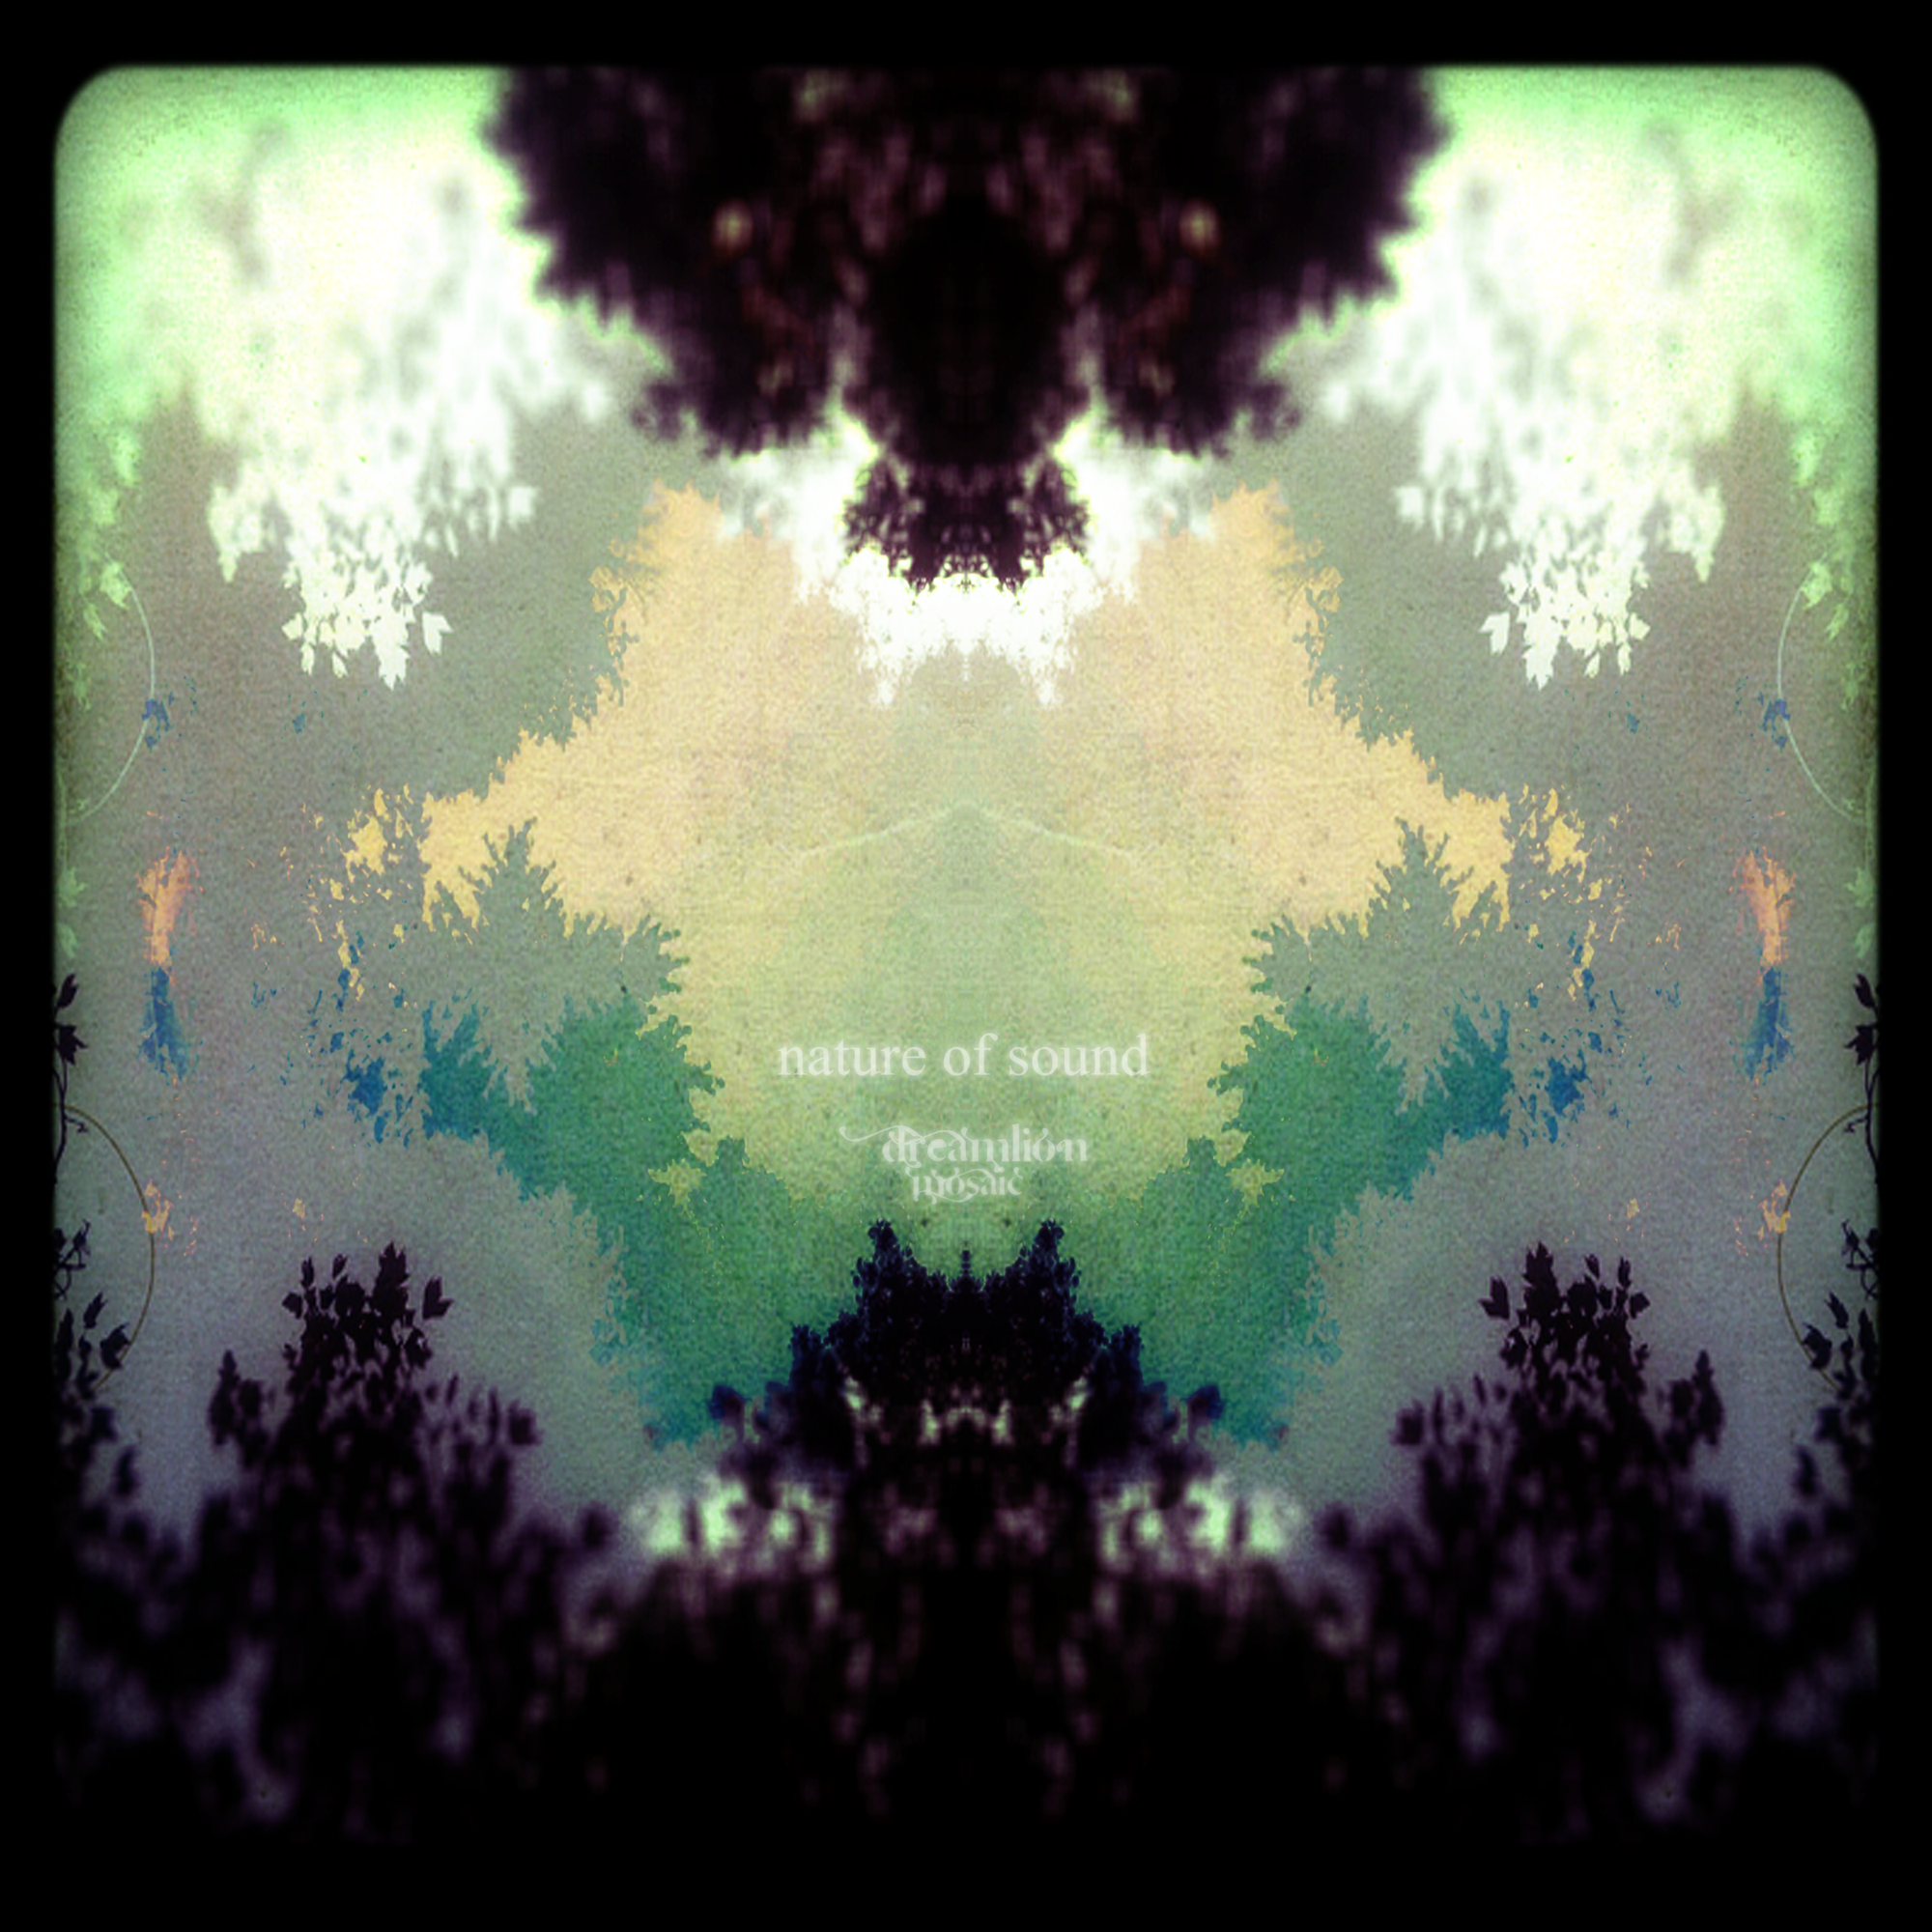 dreamlionmosaic2